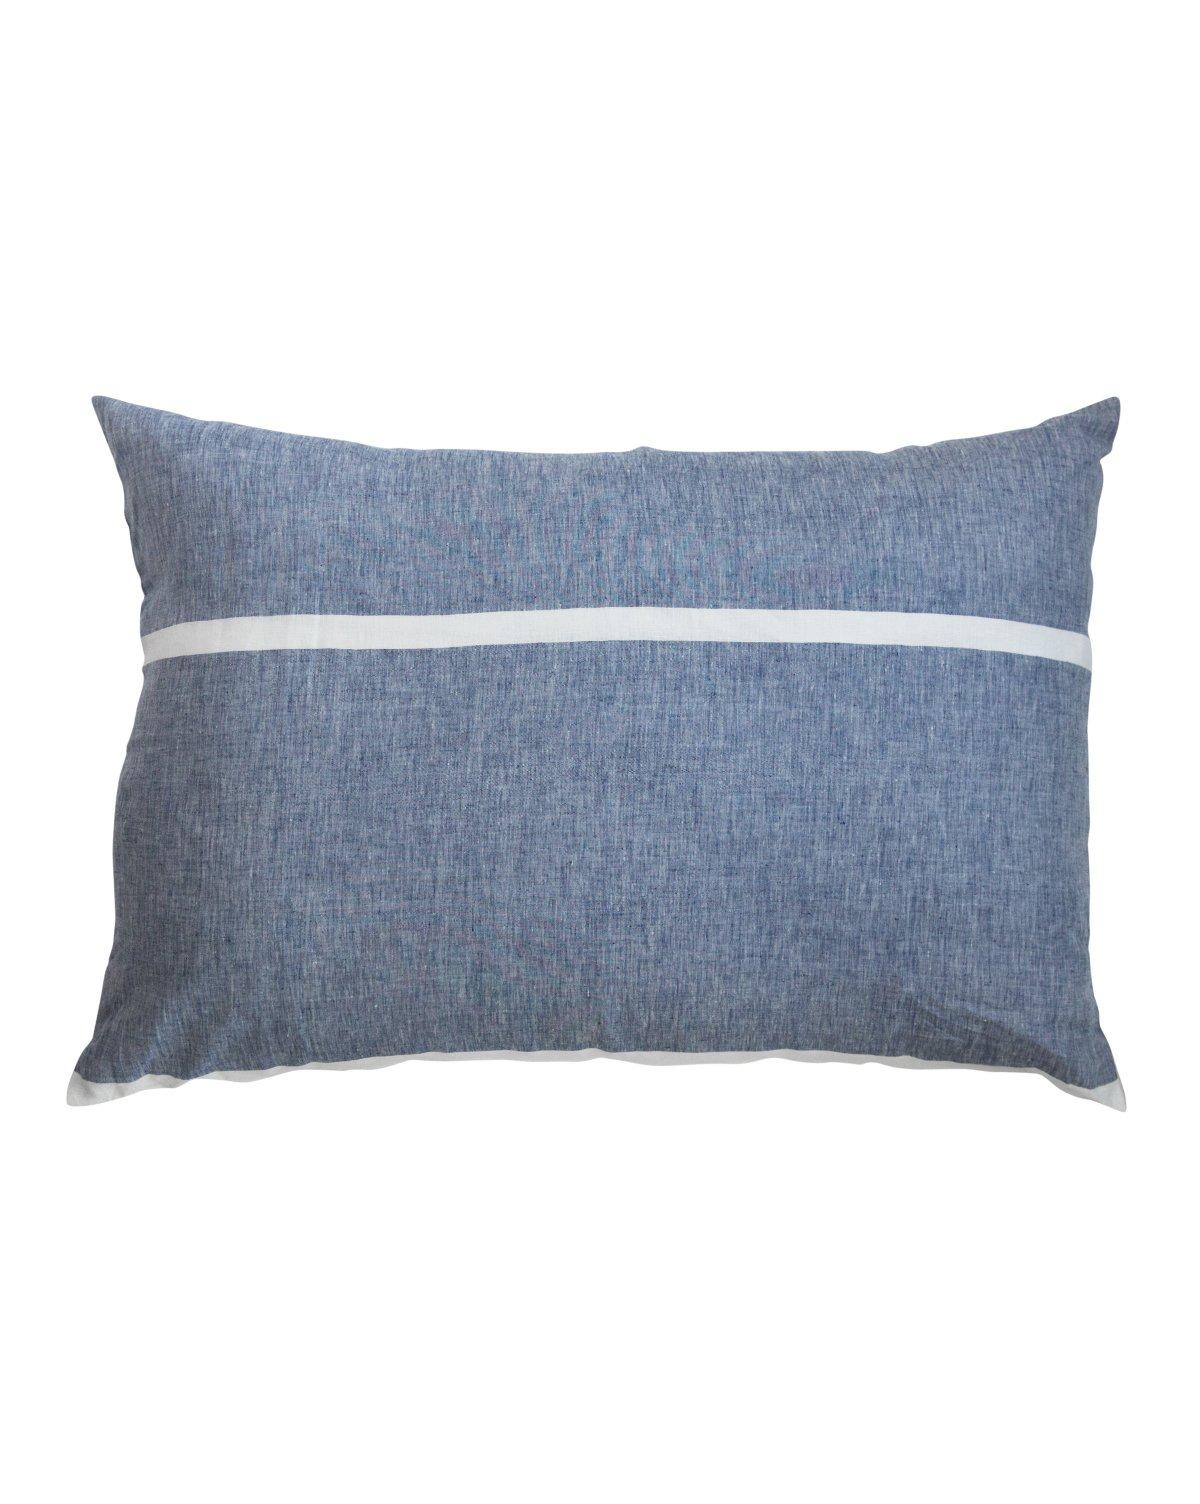 Oreta_Headboard_Cushion_Blue_No_1-1.jpg